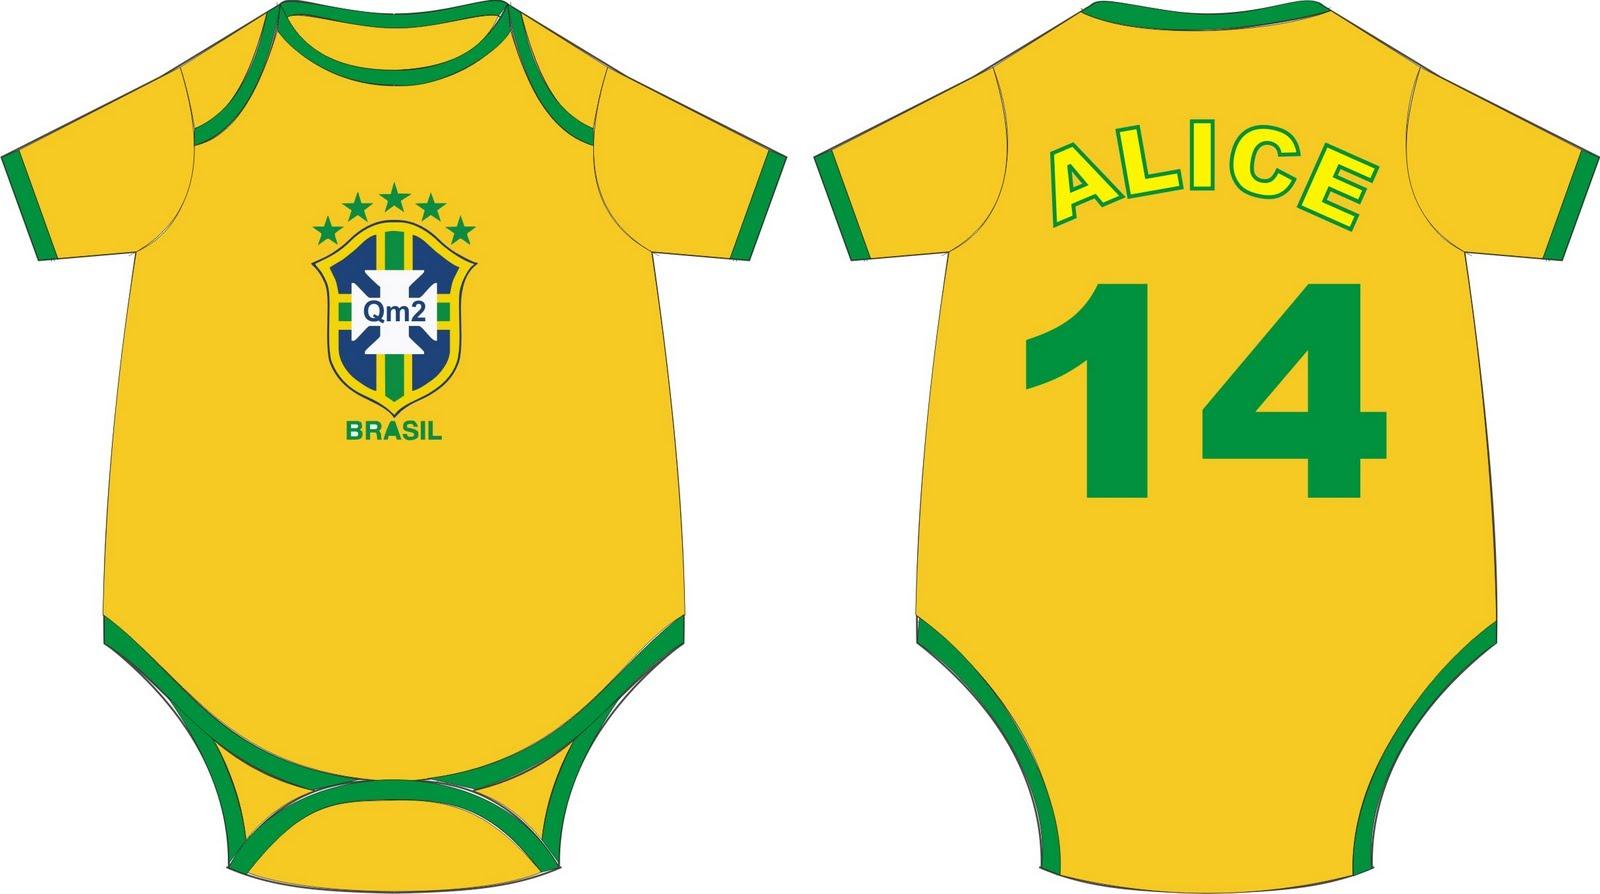 e621f6c2a4 BEBE ESTILOSO  Body do Brasil personalizado